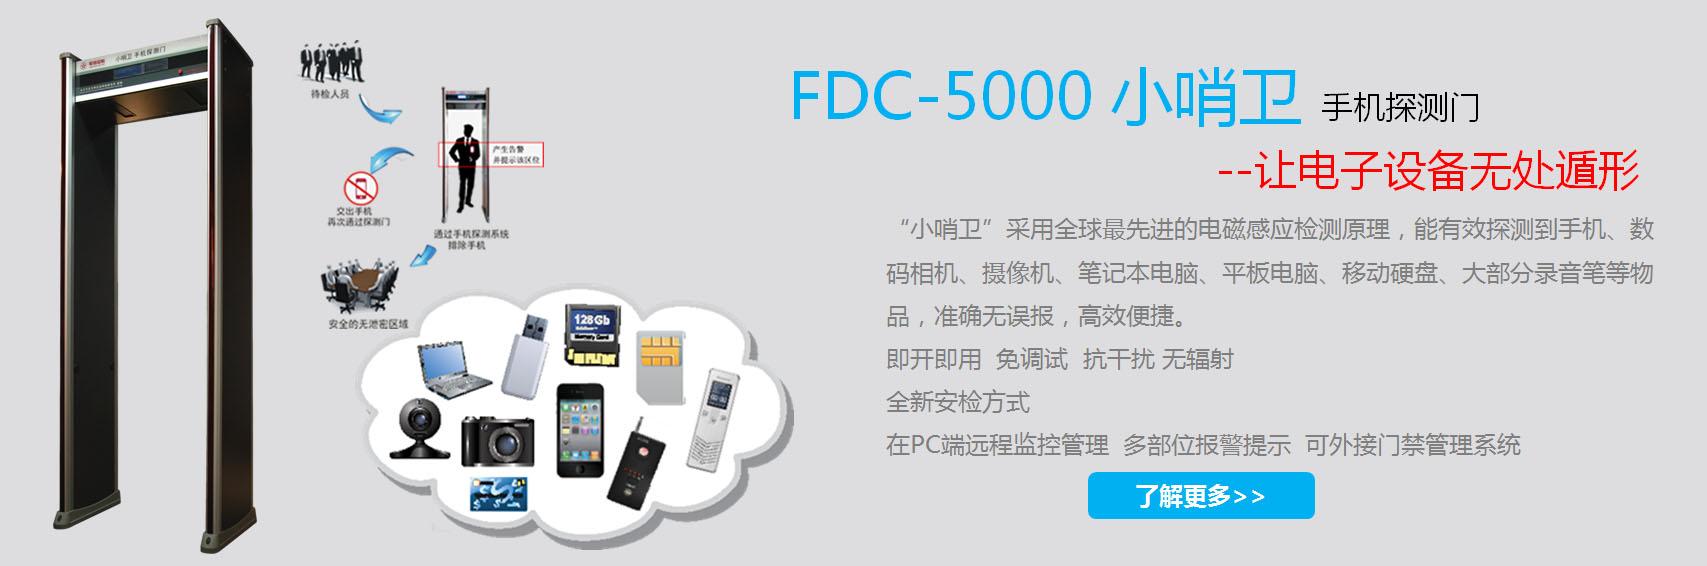 FDC-5000 小哨卫手机探测门